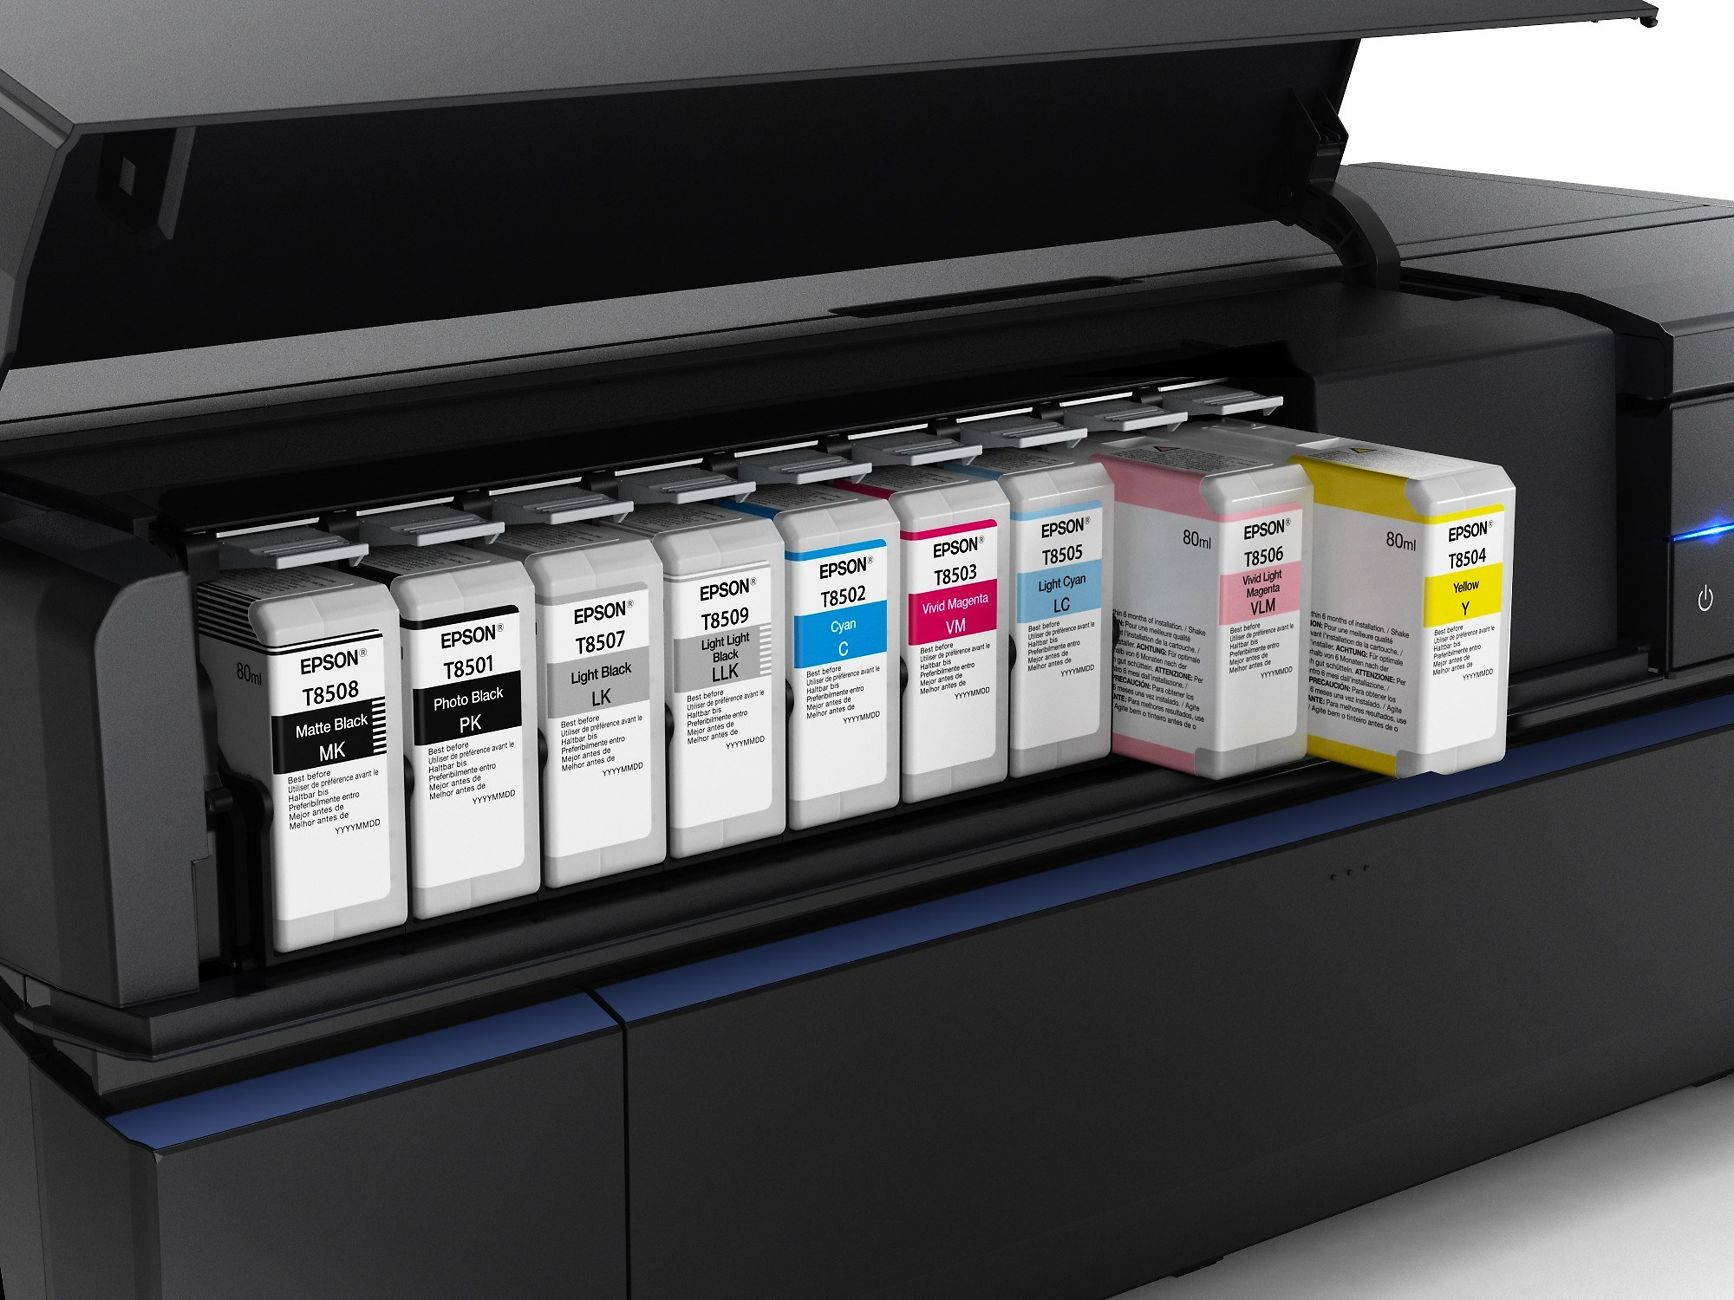 Epson SureColor P800 A2 Inkjet Printer Image